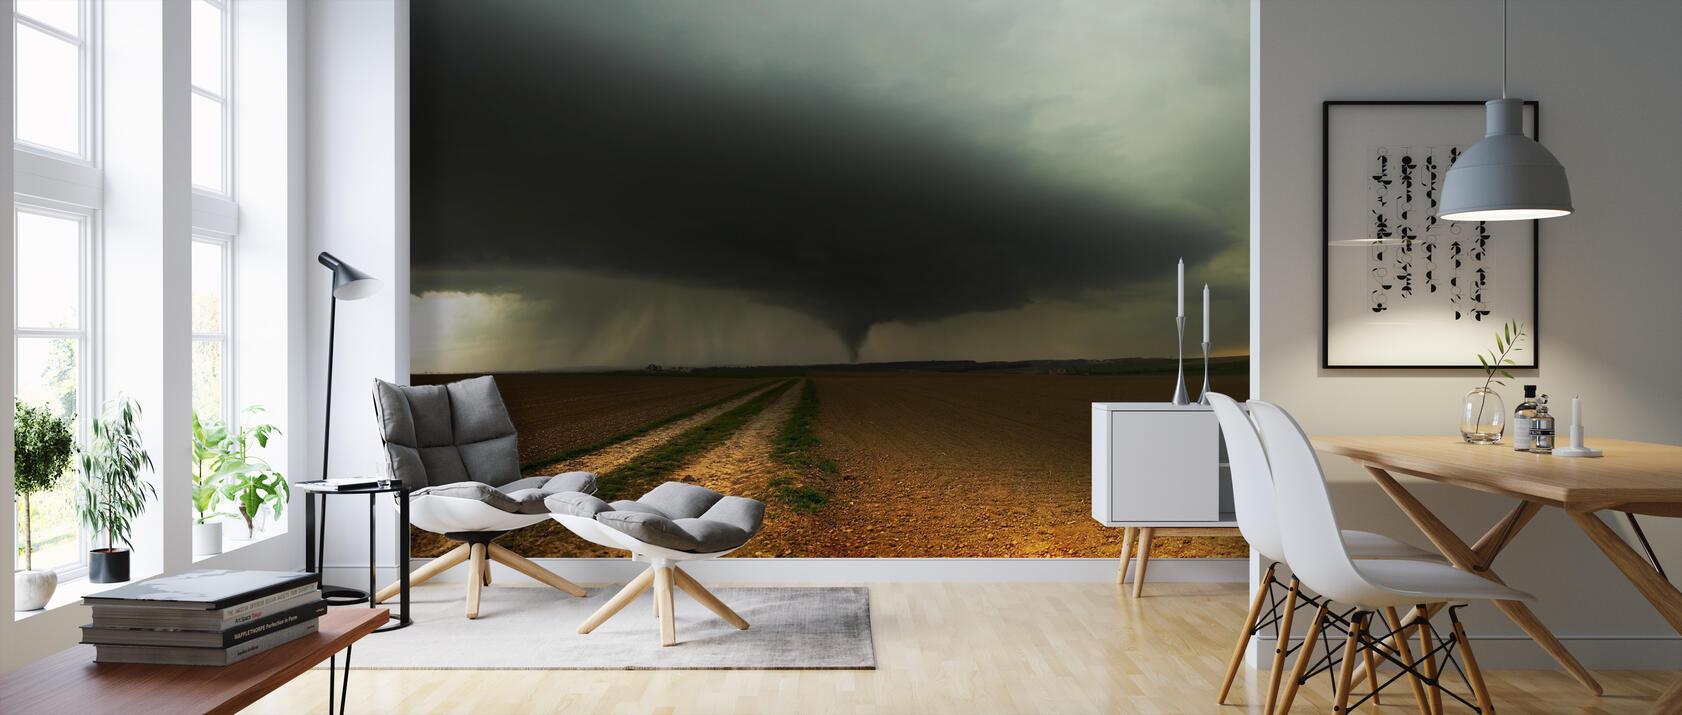 tornado landscape kostenlos gelieferte fototapete von h chster qualit t photowall. Black Bedroom Furniture Sets. Home Design Ideas